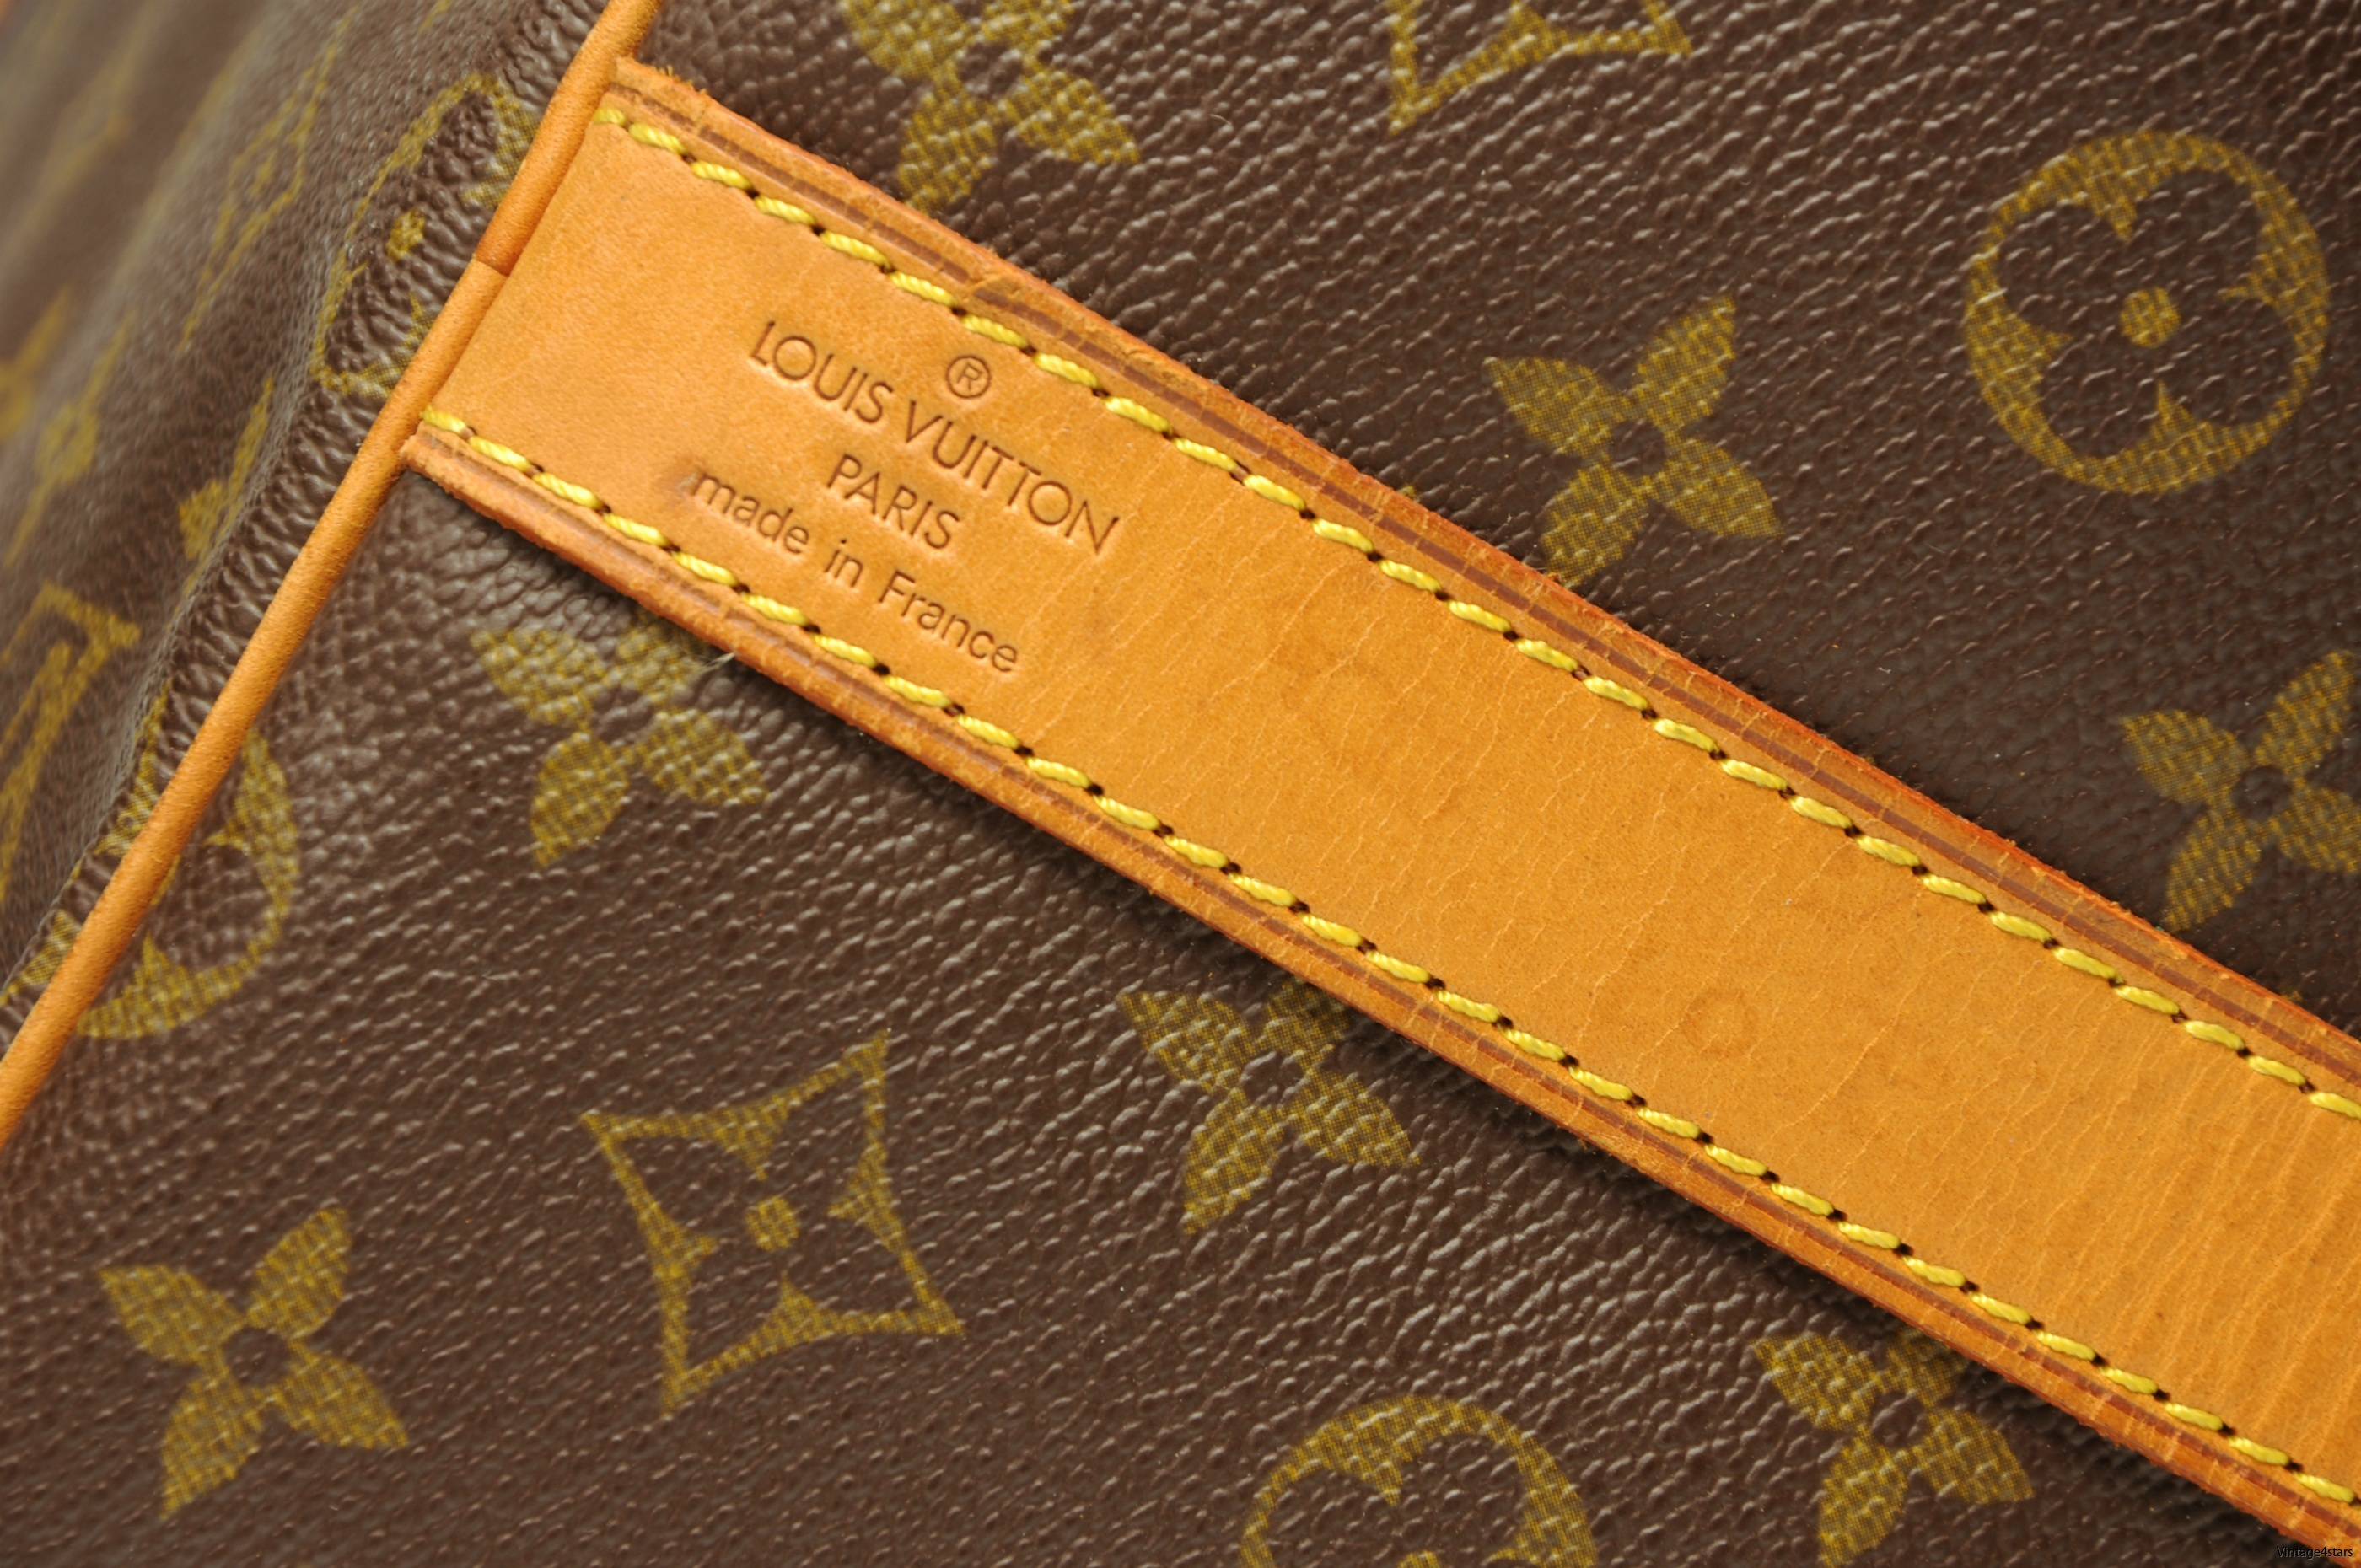 Louis Vuitton Keepall 55 Monogram 7